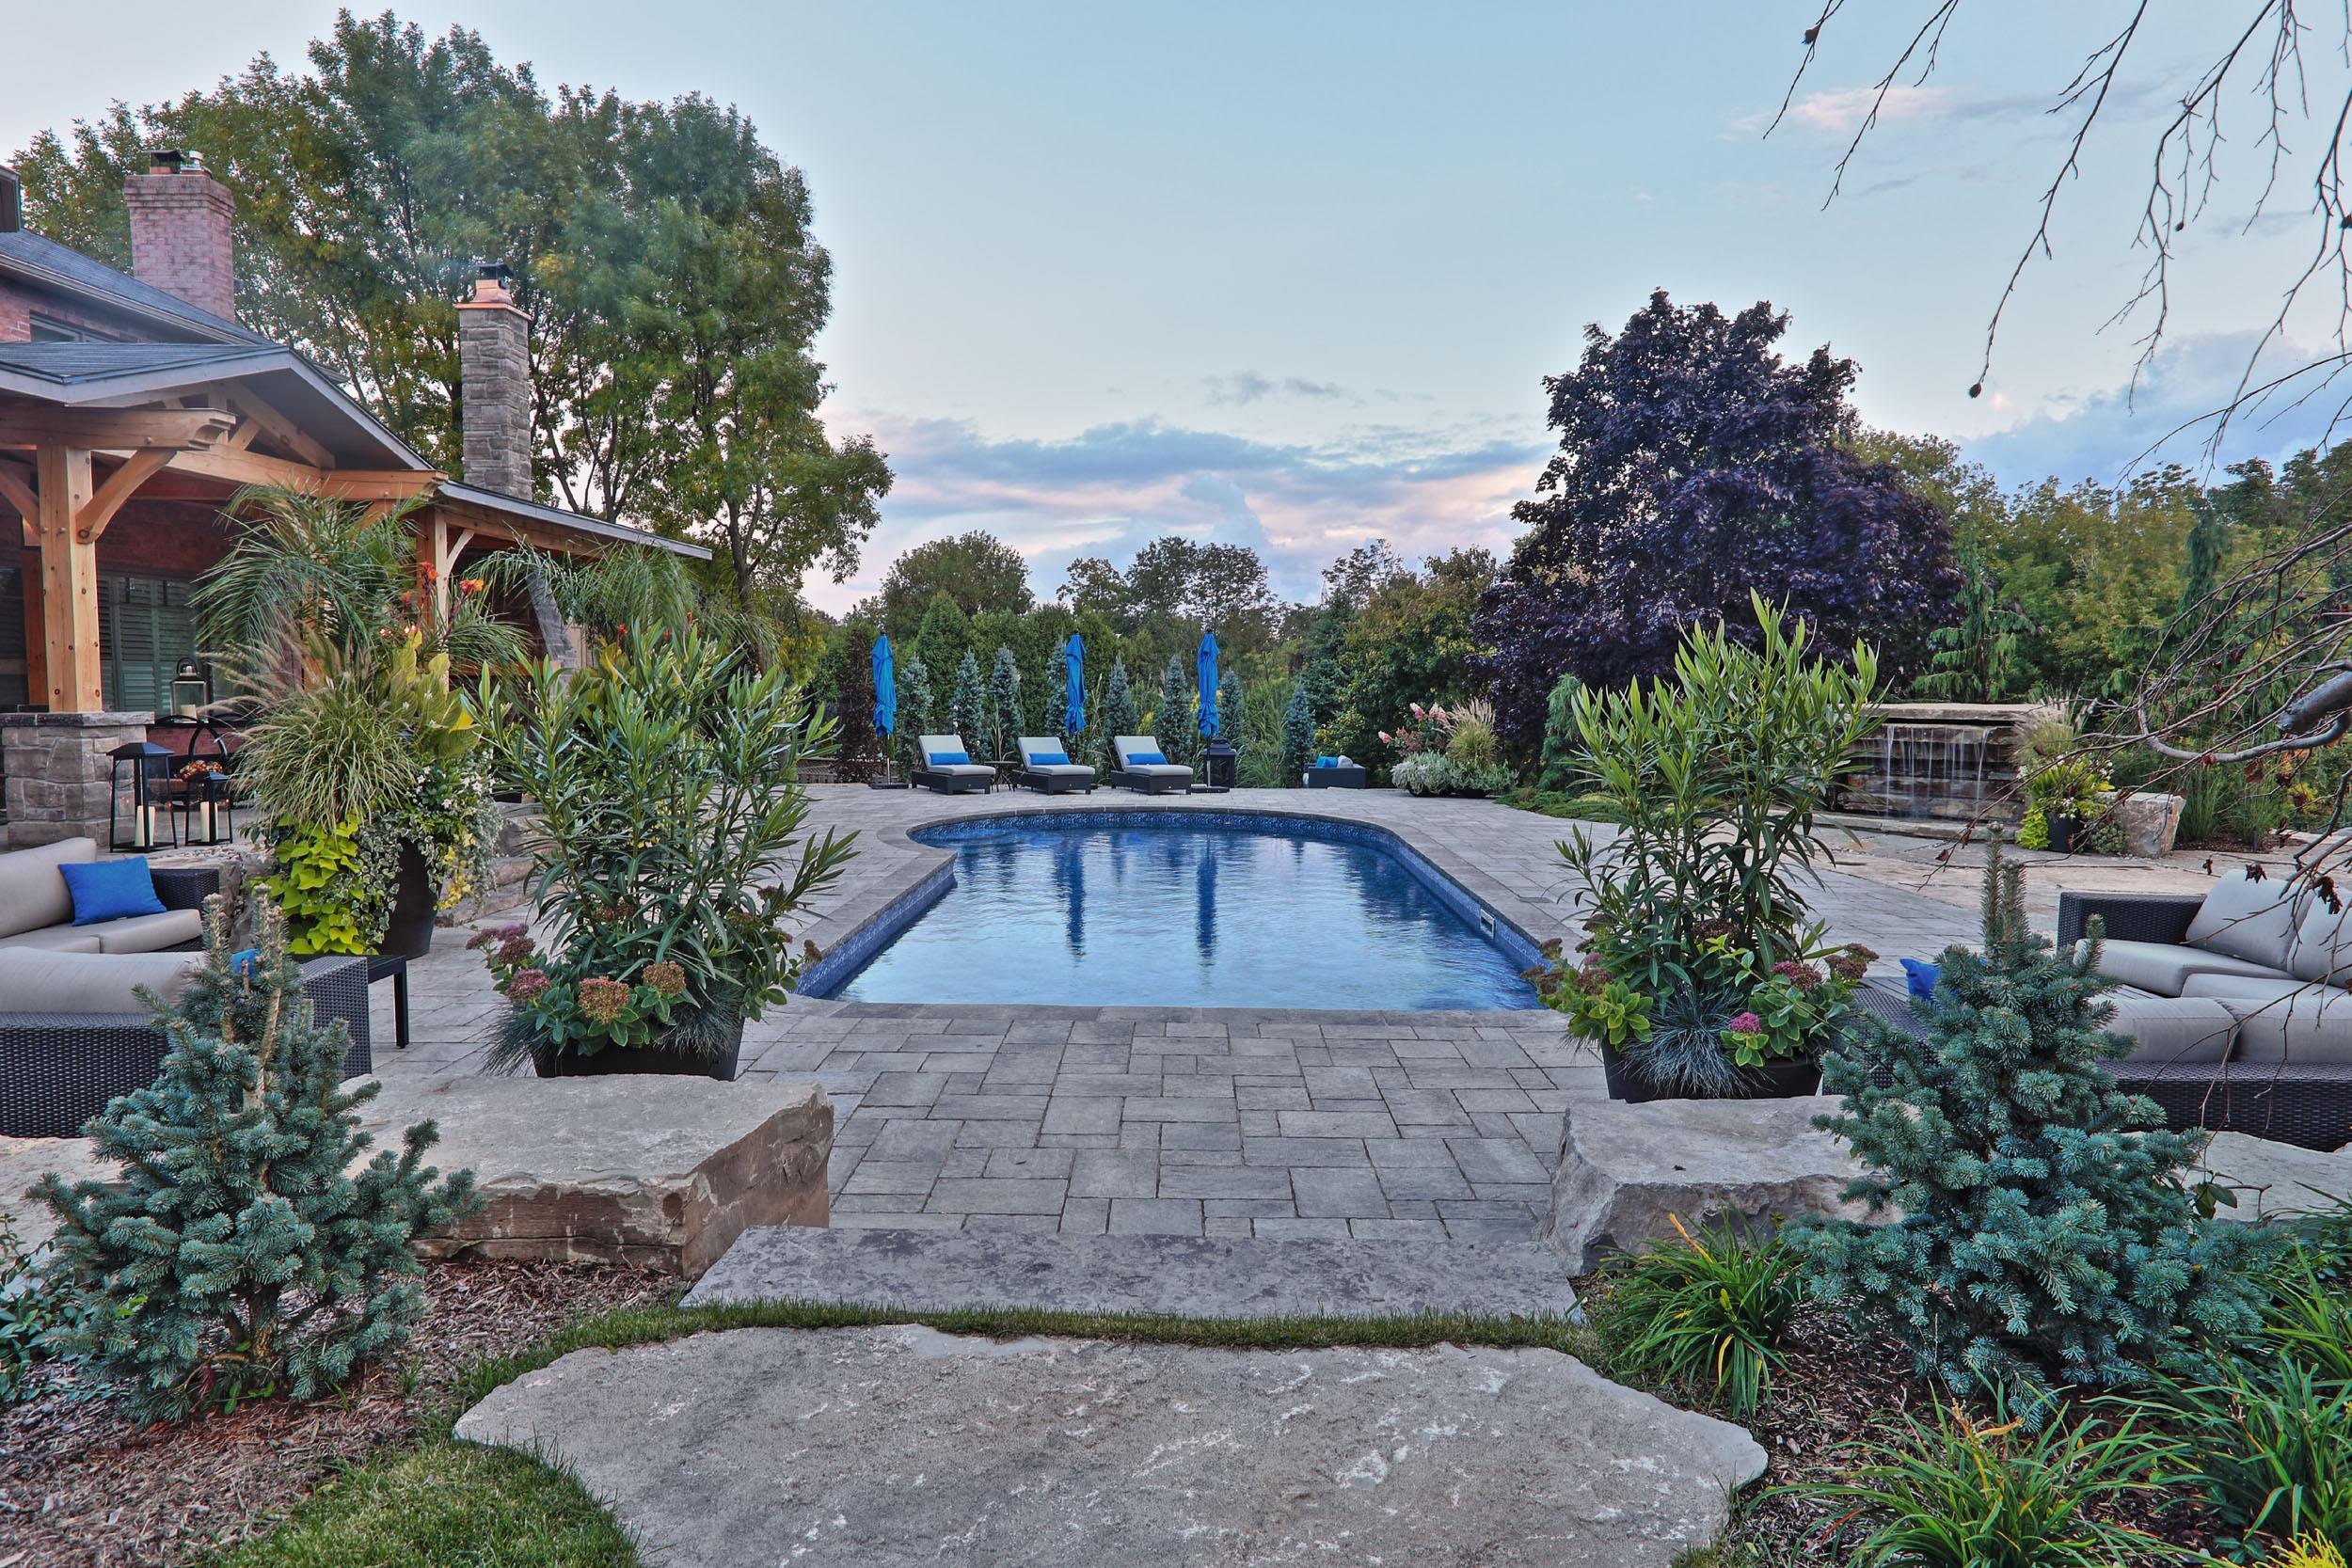 Outdoor Inground Residential Swimmin